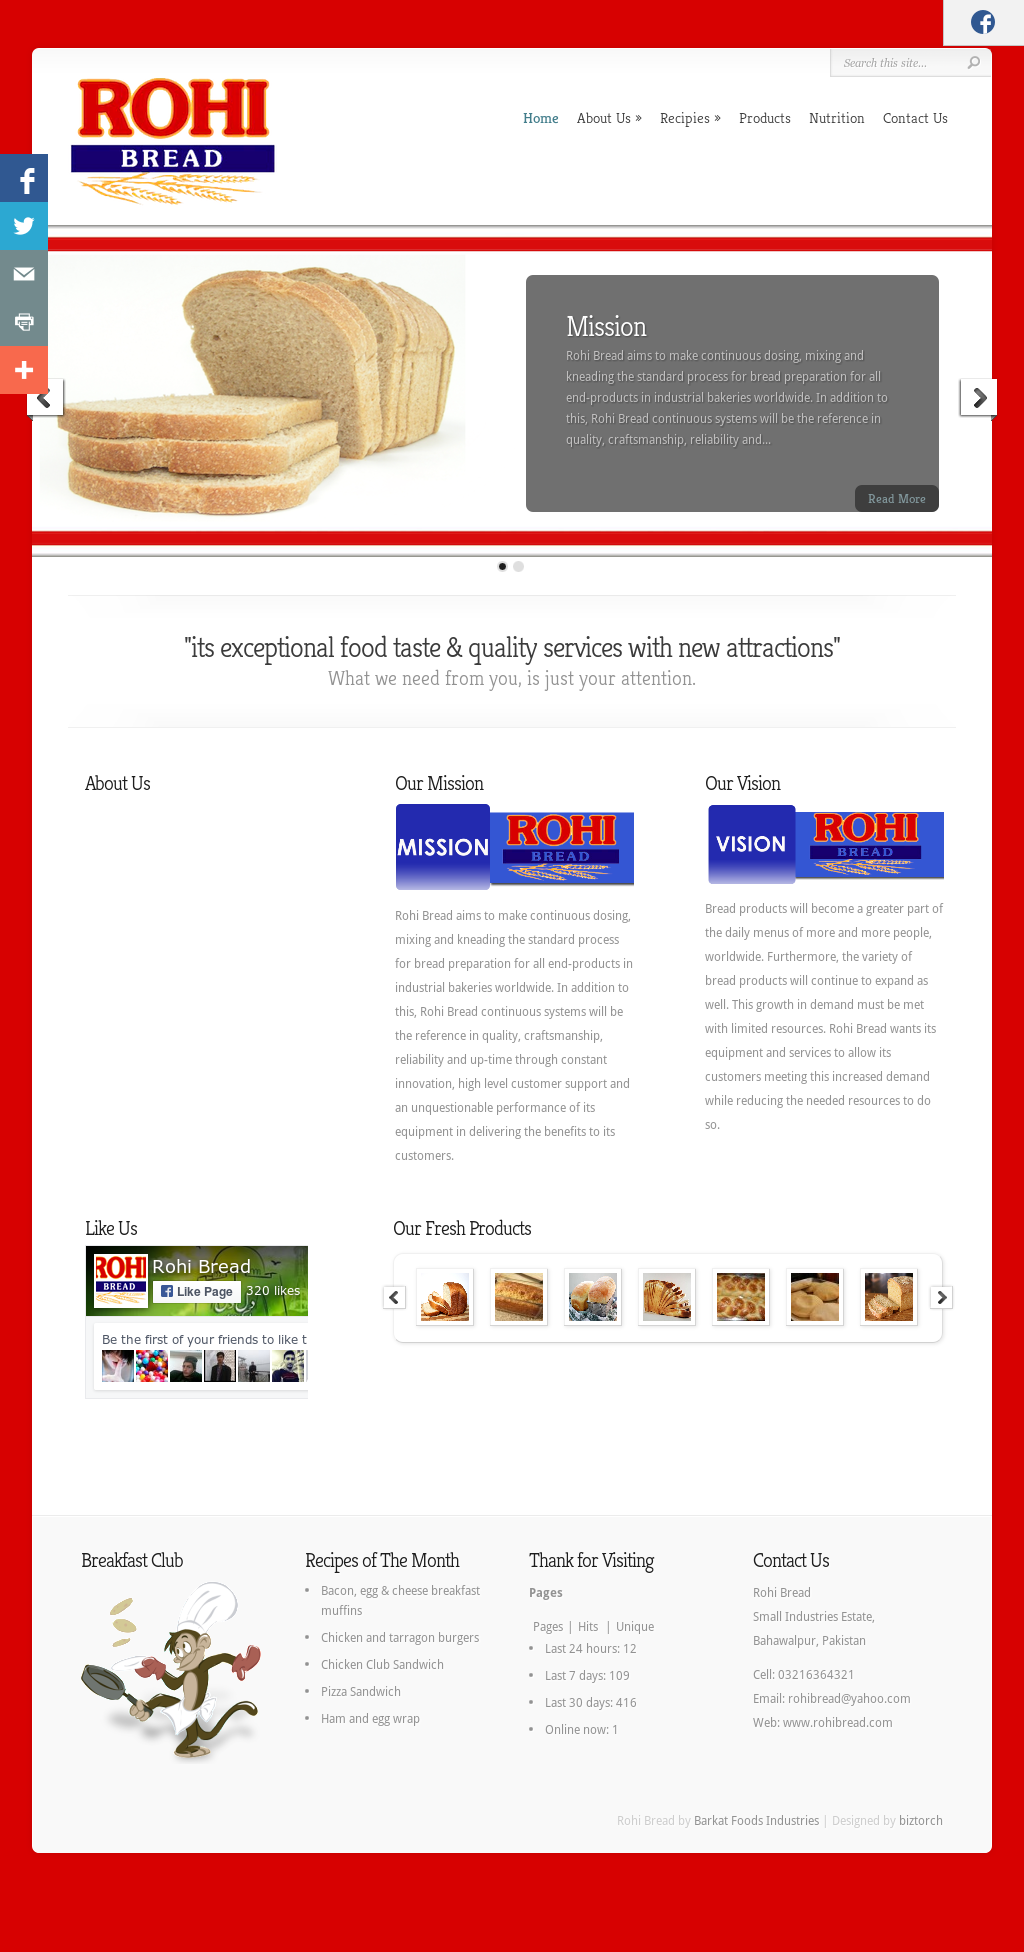 Rohi website